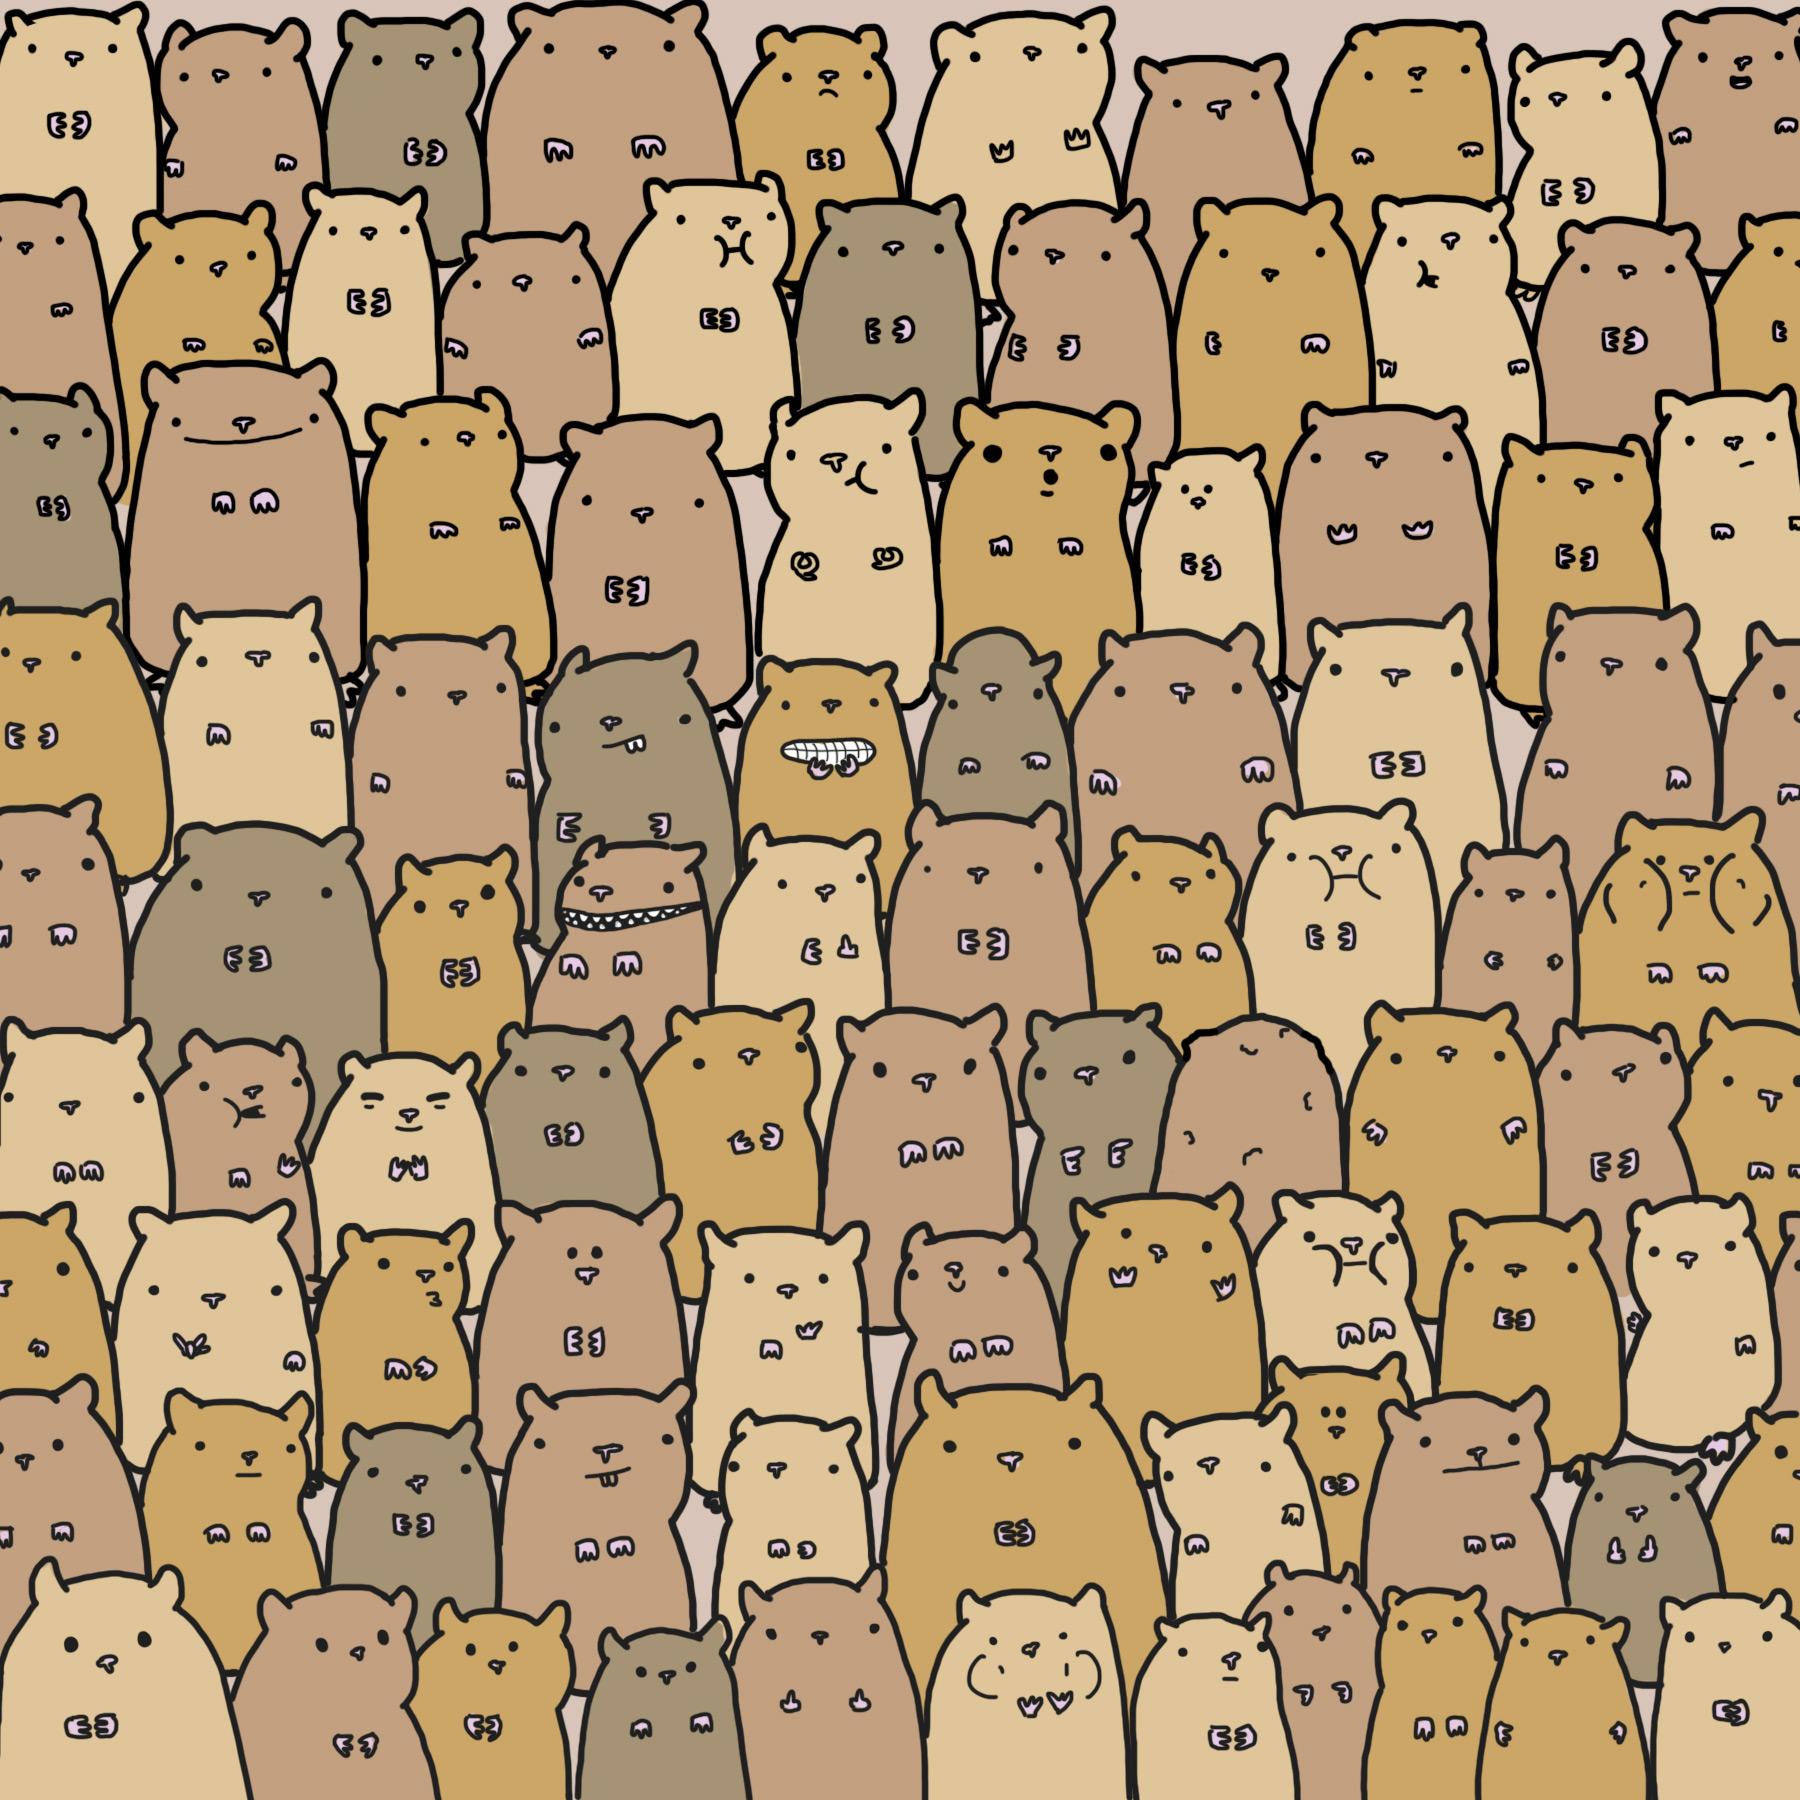 hamster-puzzle.jpg